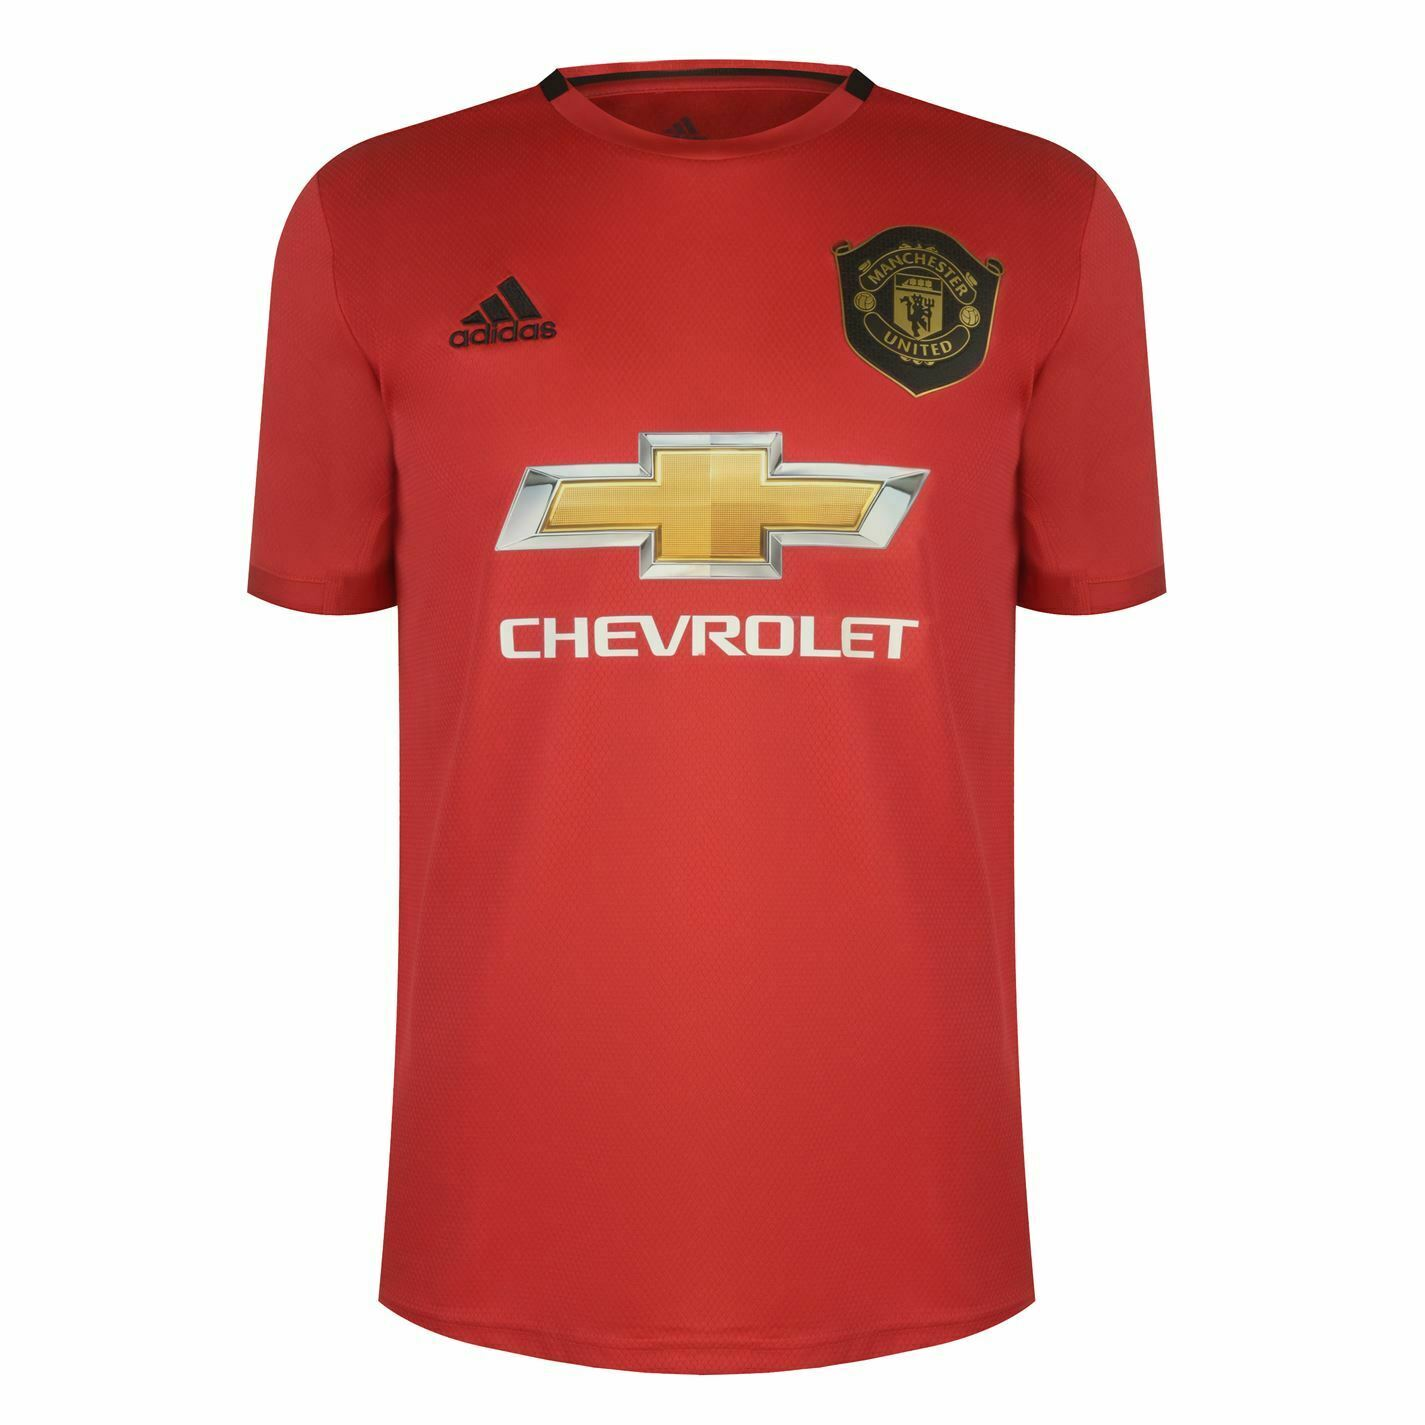 Adidas Mens Manchester United Home Shirt 2019 2020 Domestic Short Sleeve Crew